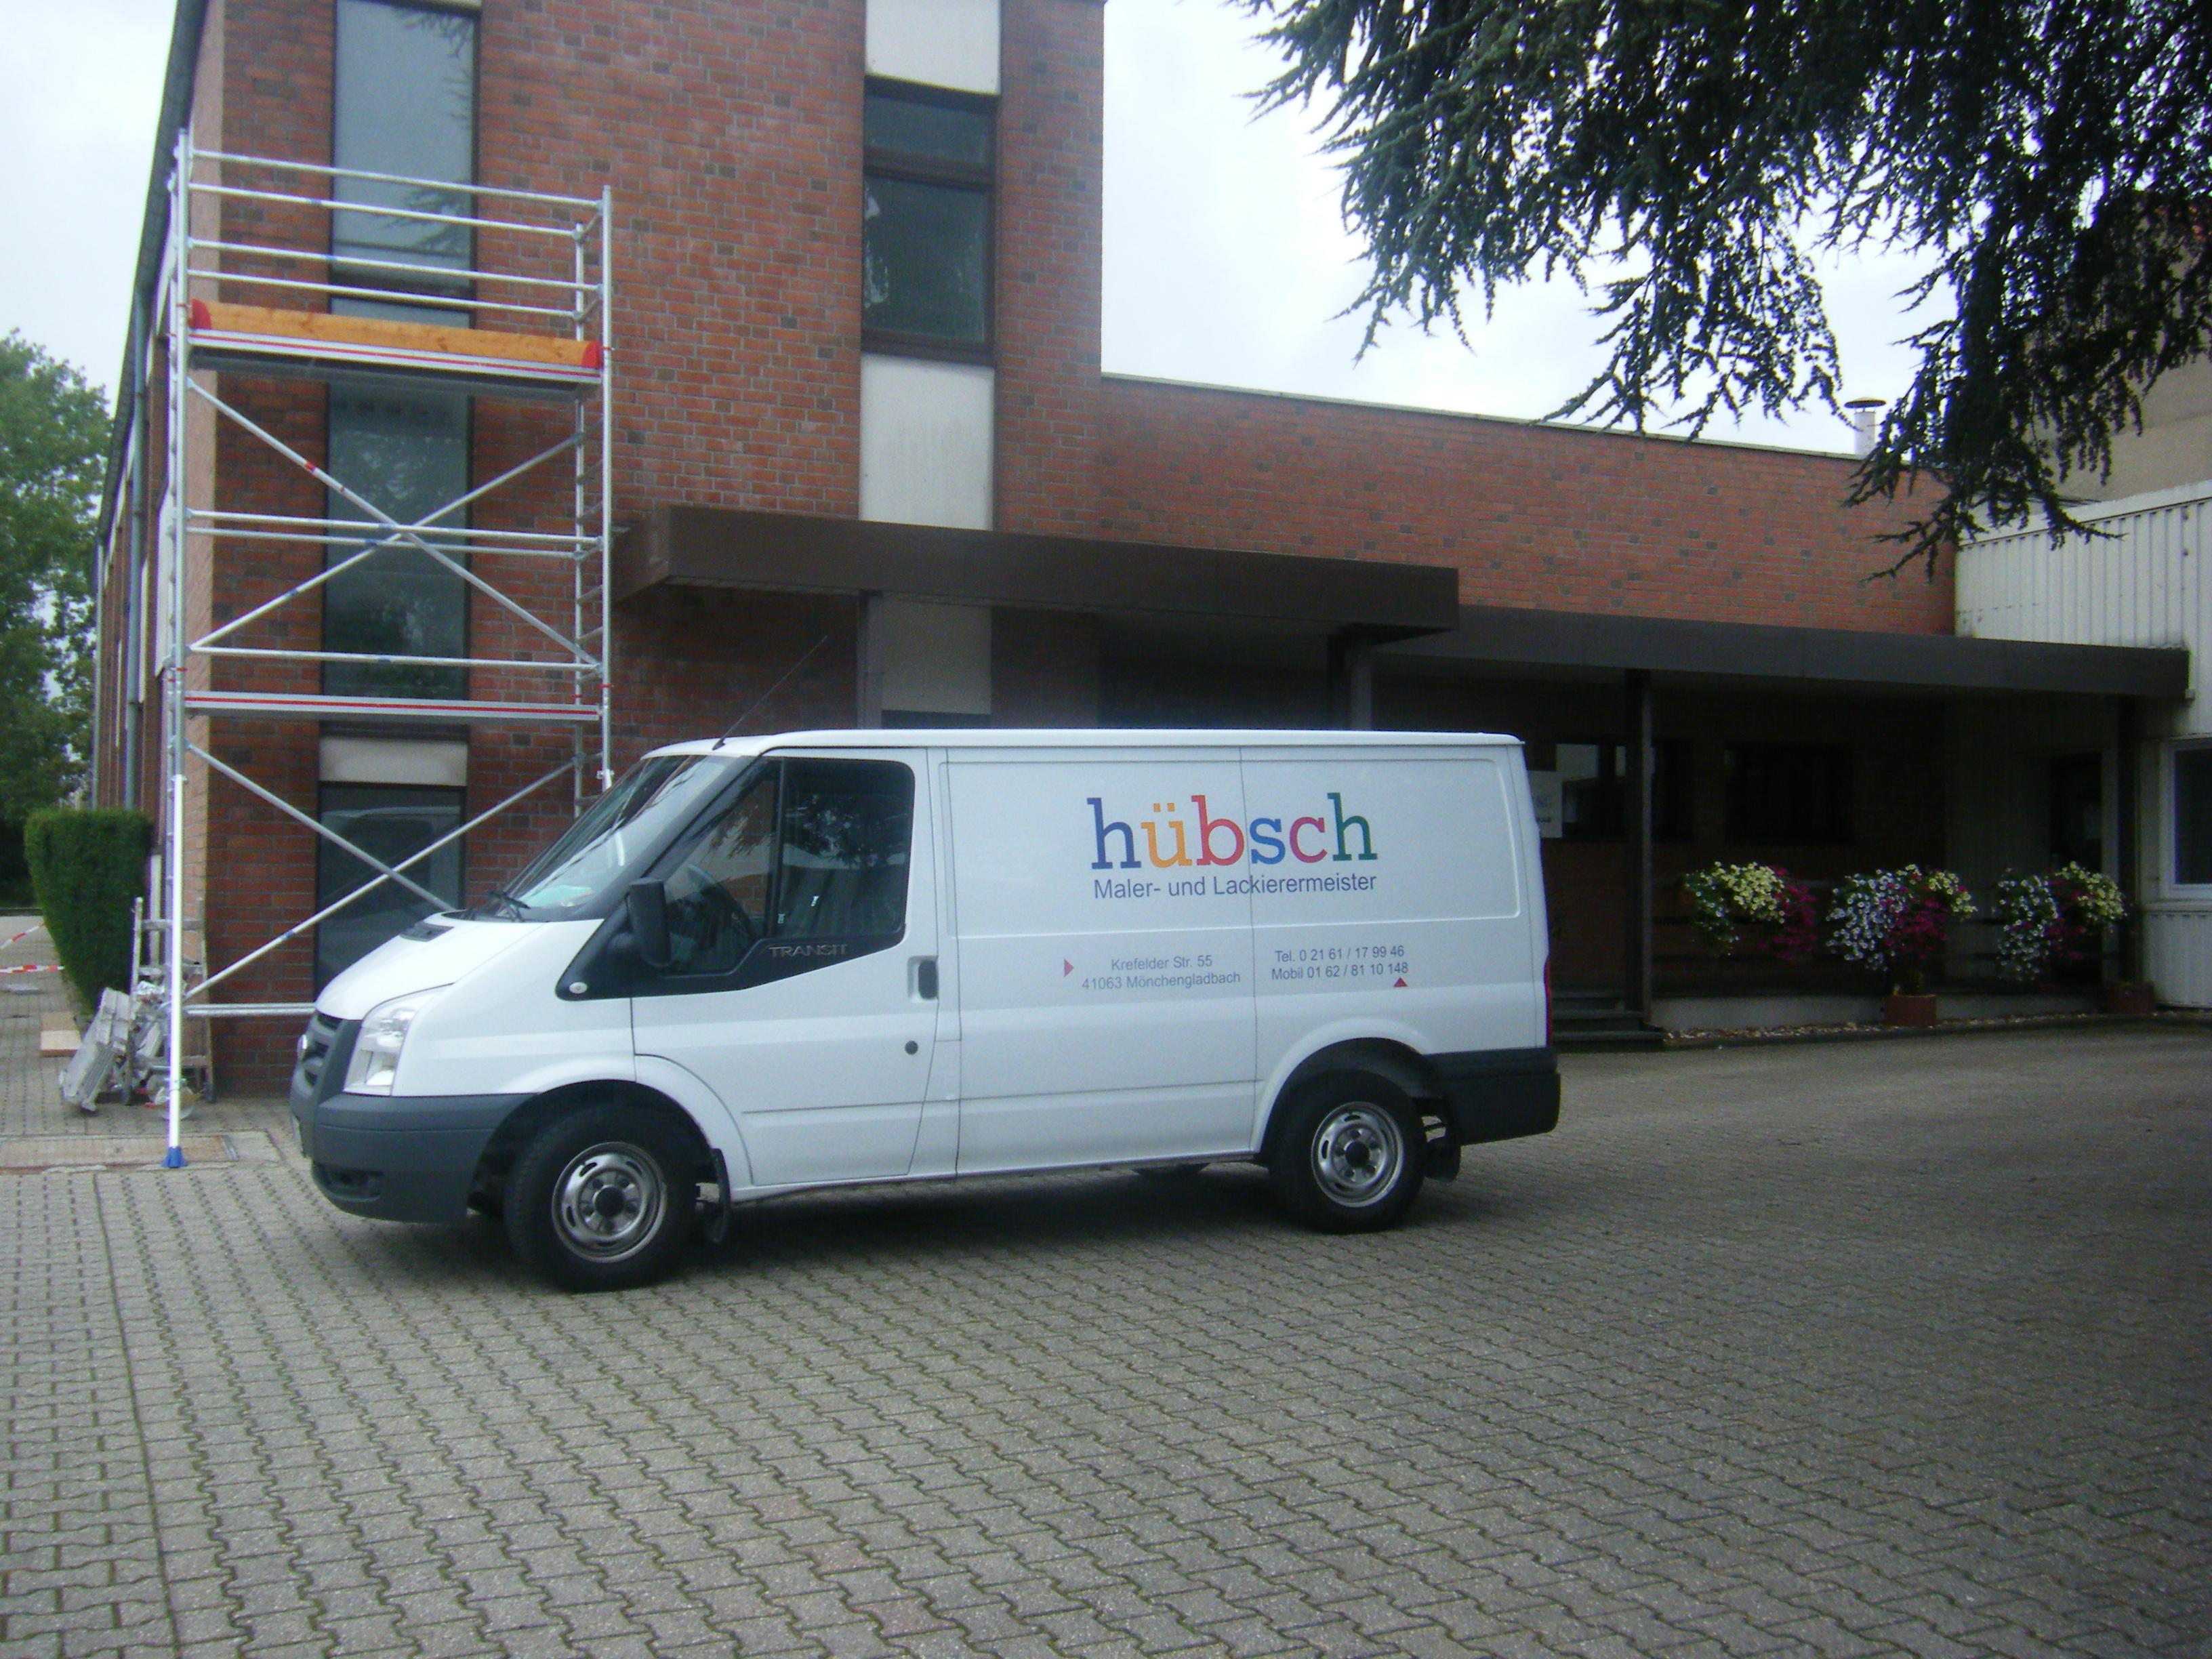 Malerbetrieb Hartmuth Hübsch